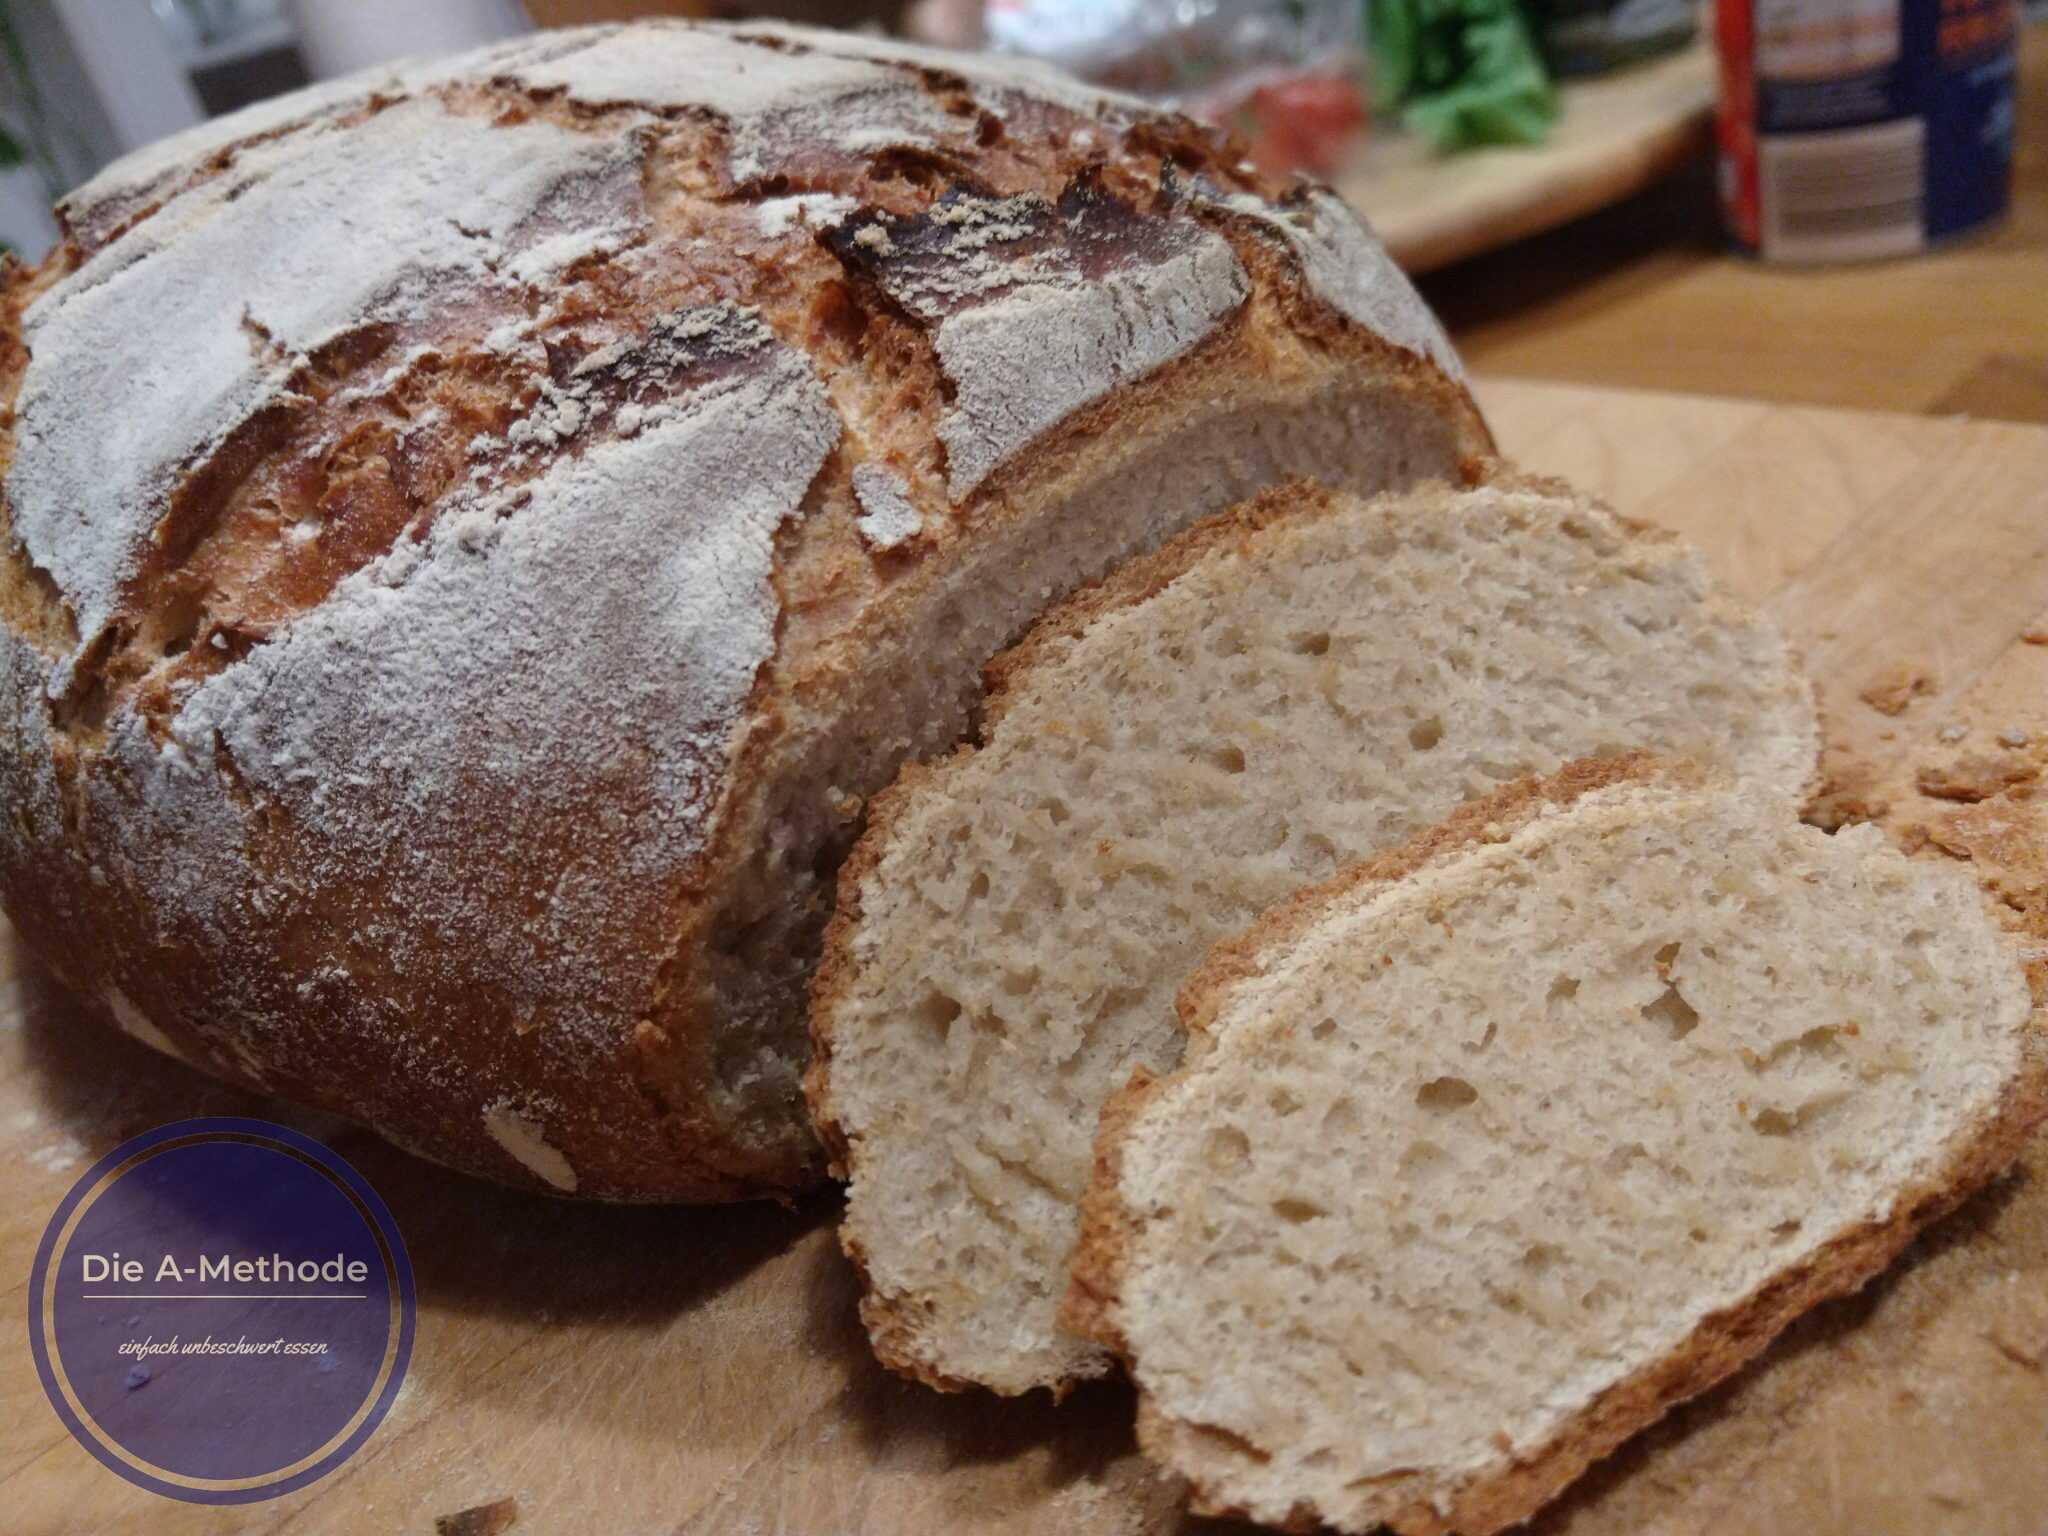 Friss dich dumm Brot - Die A-Methode